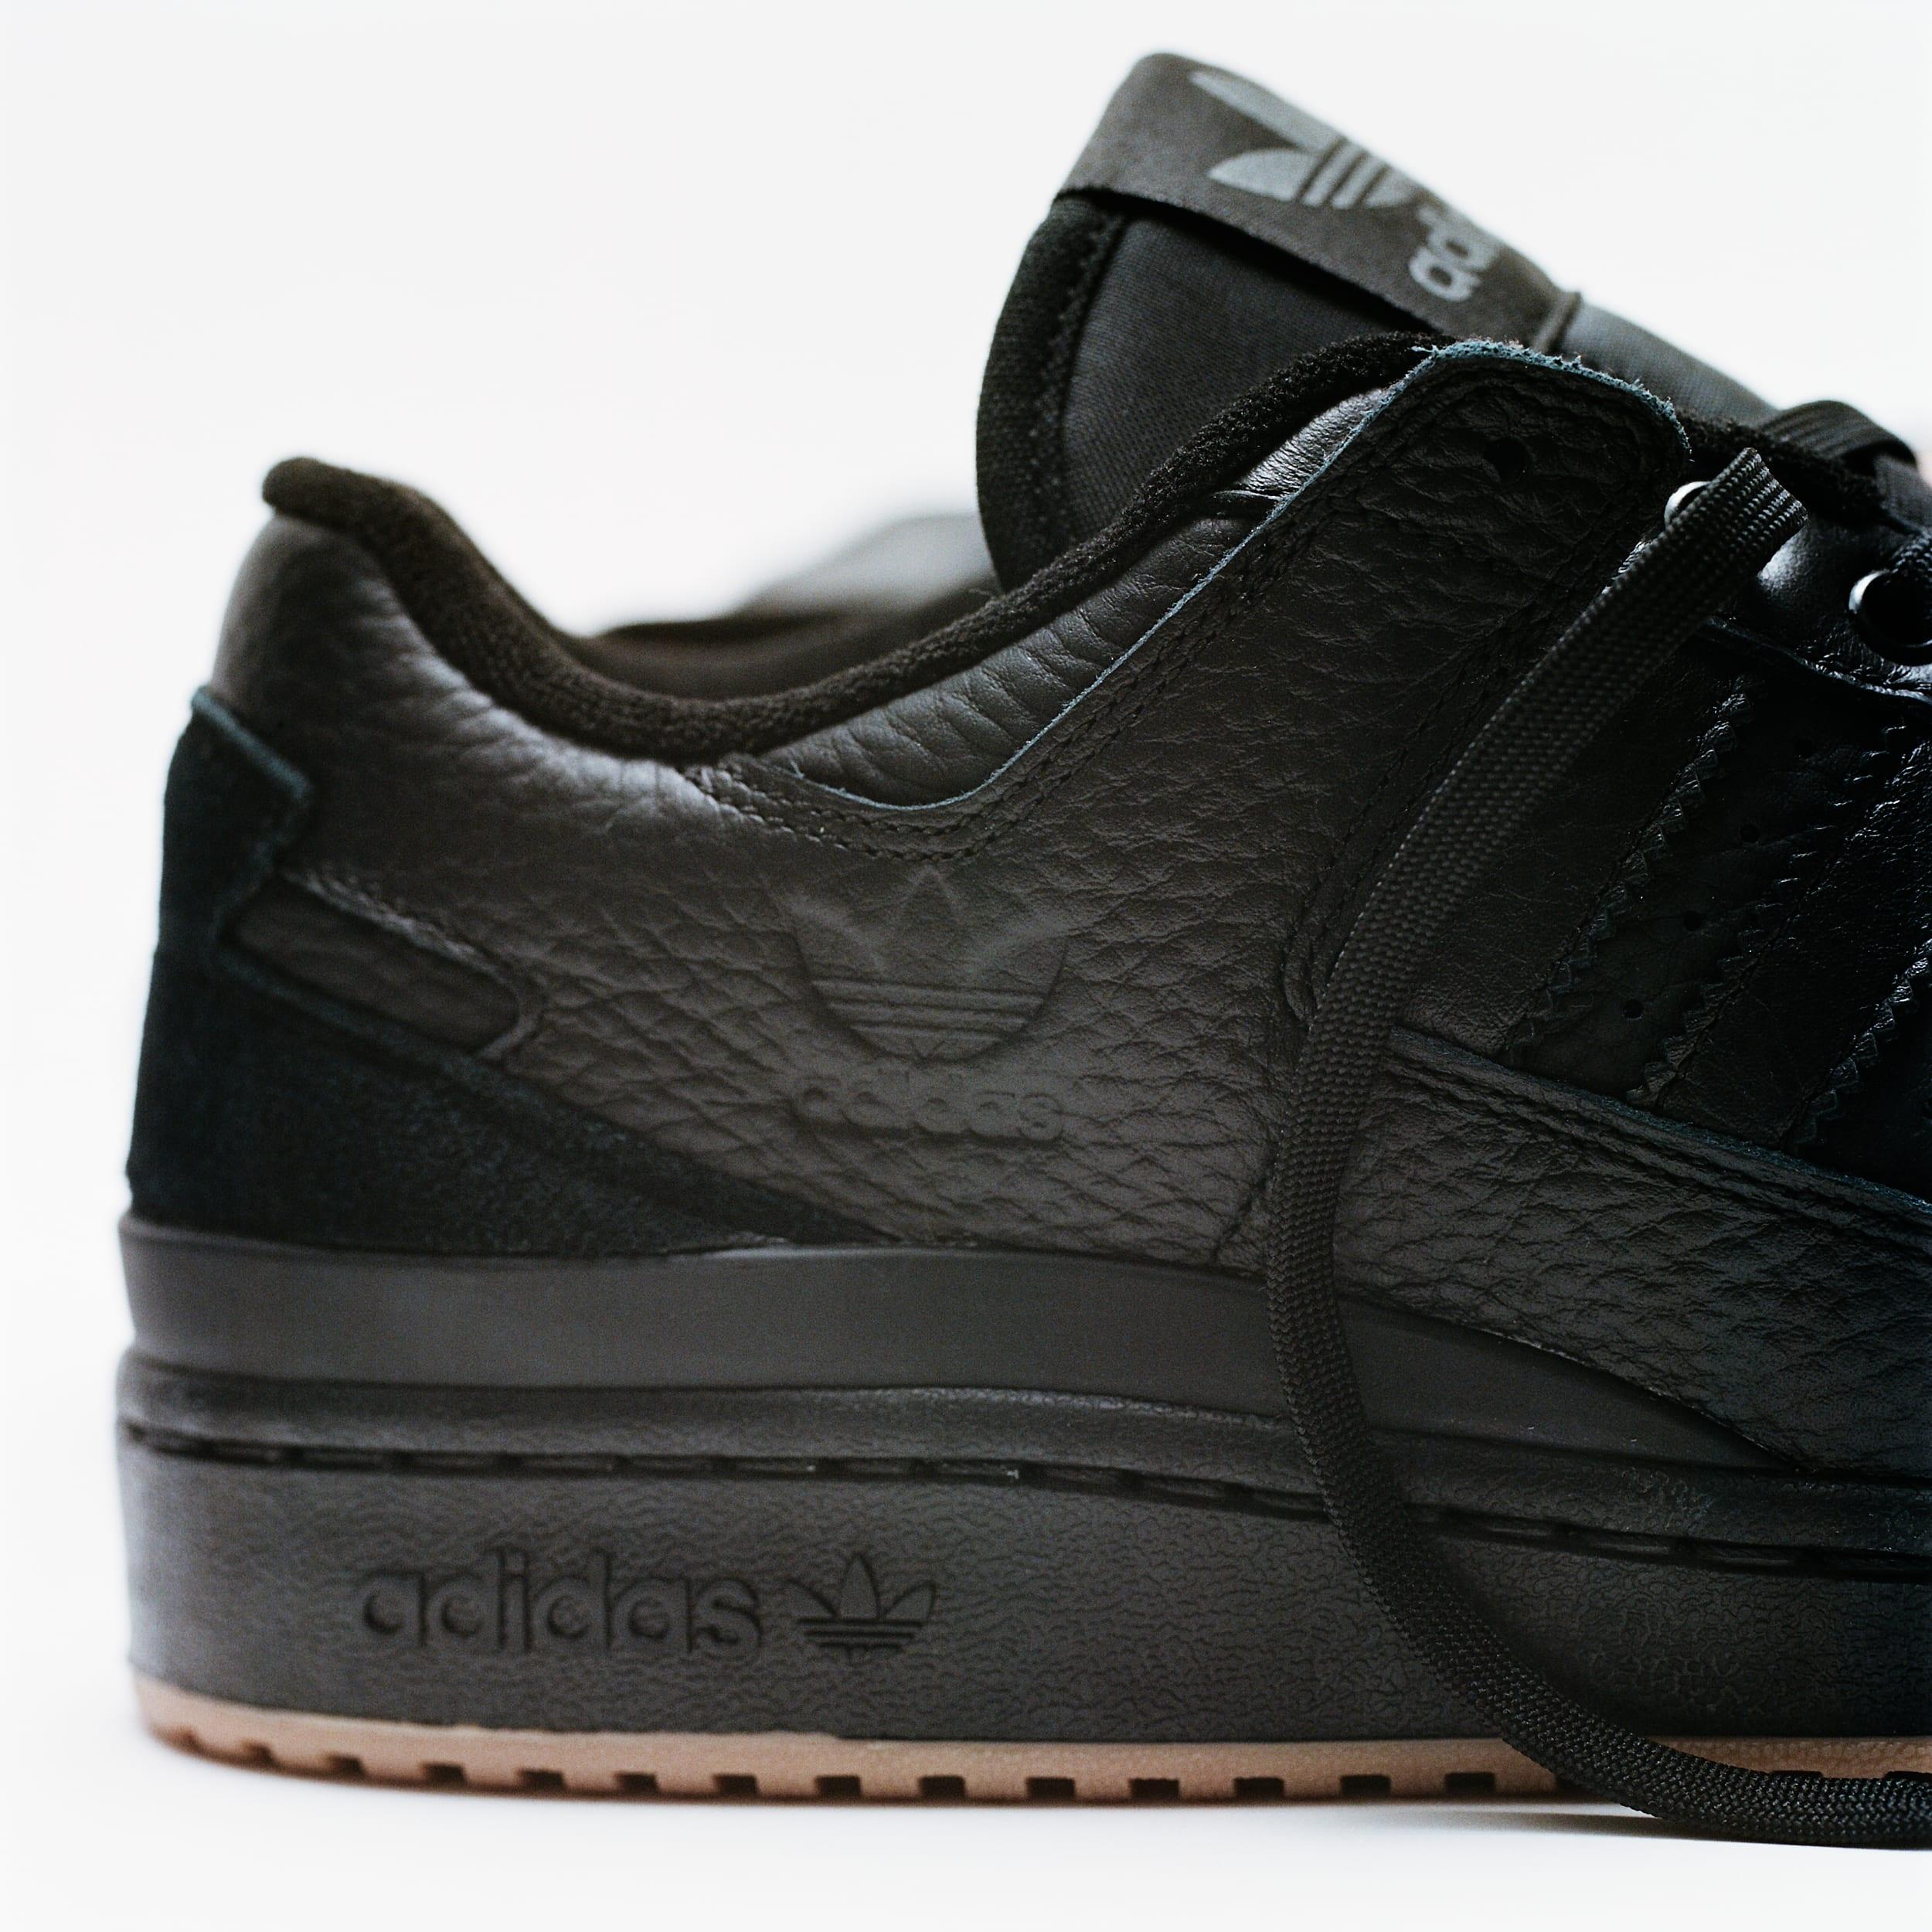 Adidas Forum 84 ADV Black Heel